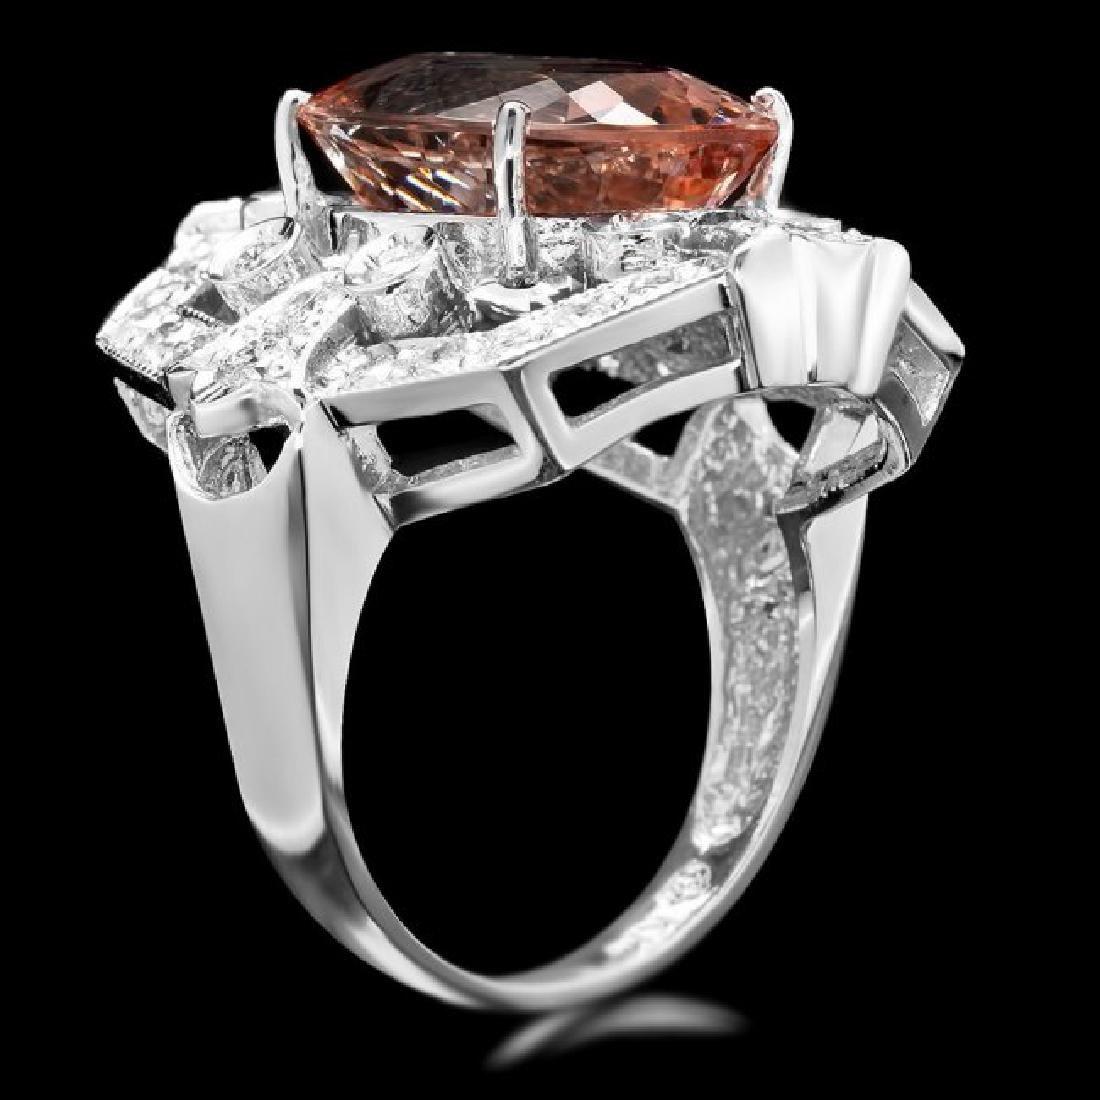 14k Gold 7.50ct Morganite 1.35ct Diamond Ring - 3